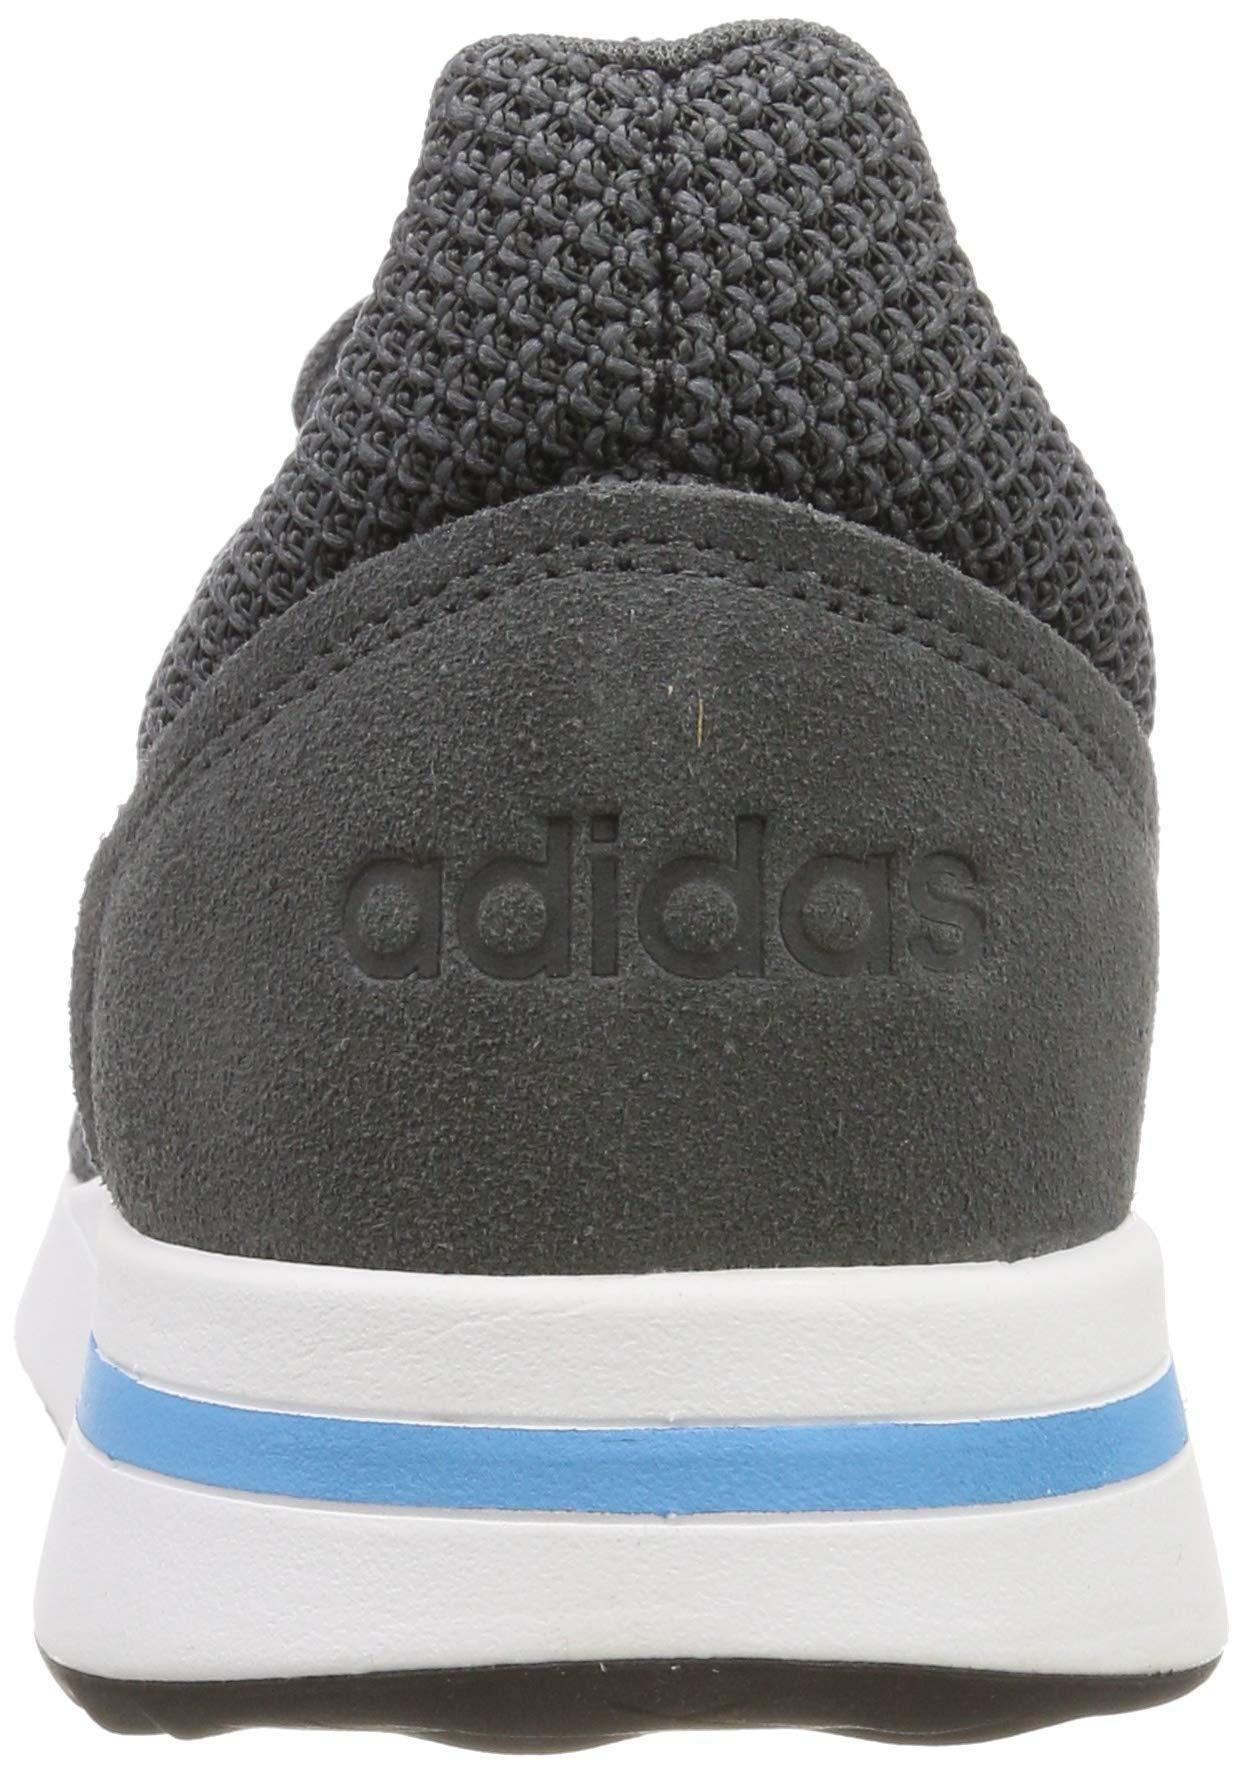 adidas Run70s, Scarpe da Running Uomo 2 spesavip